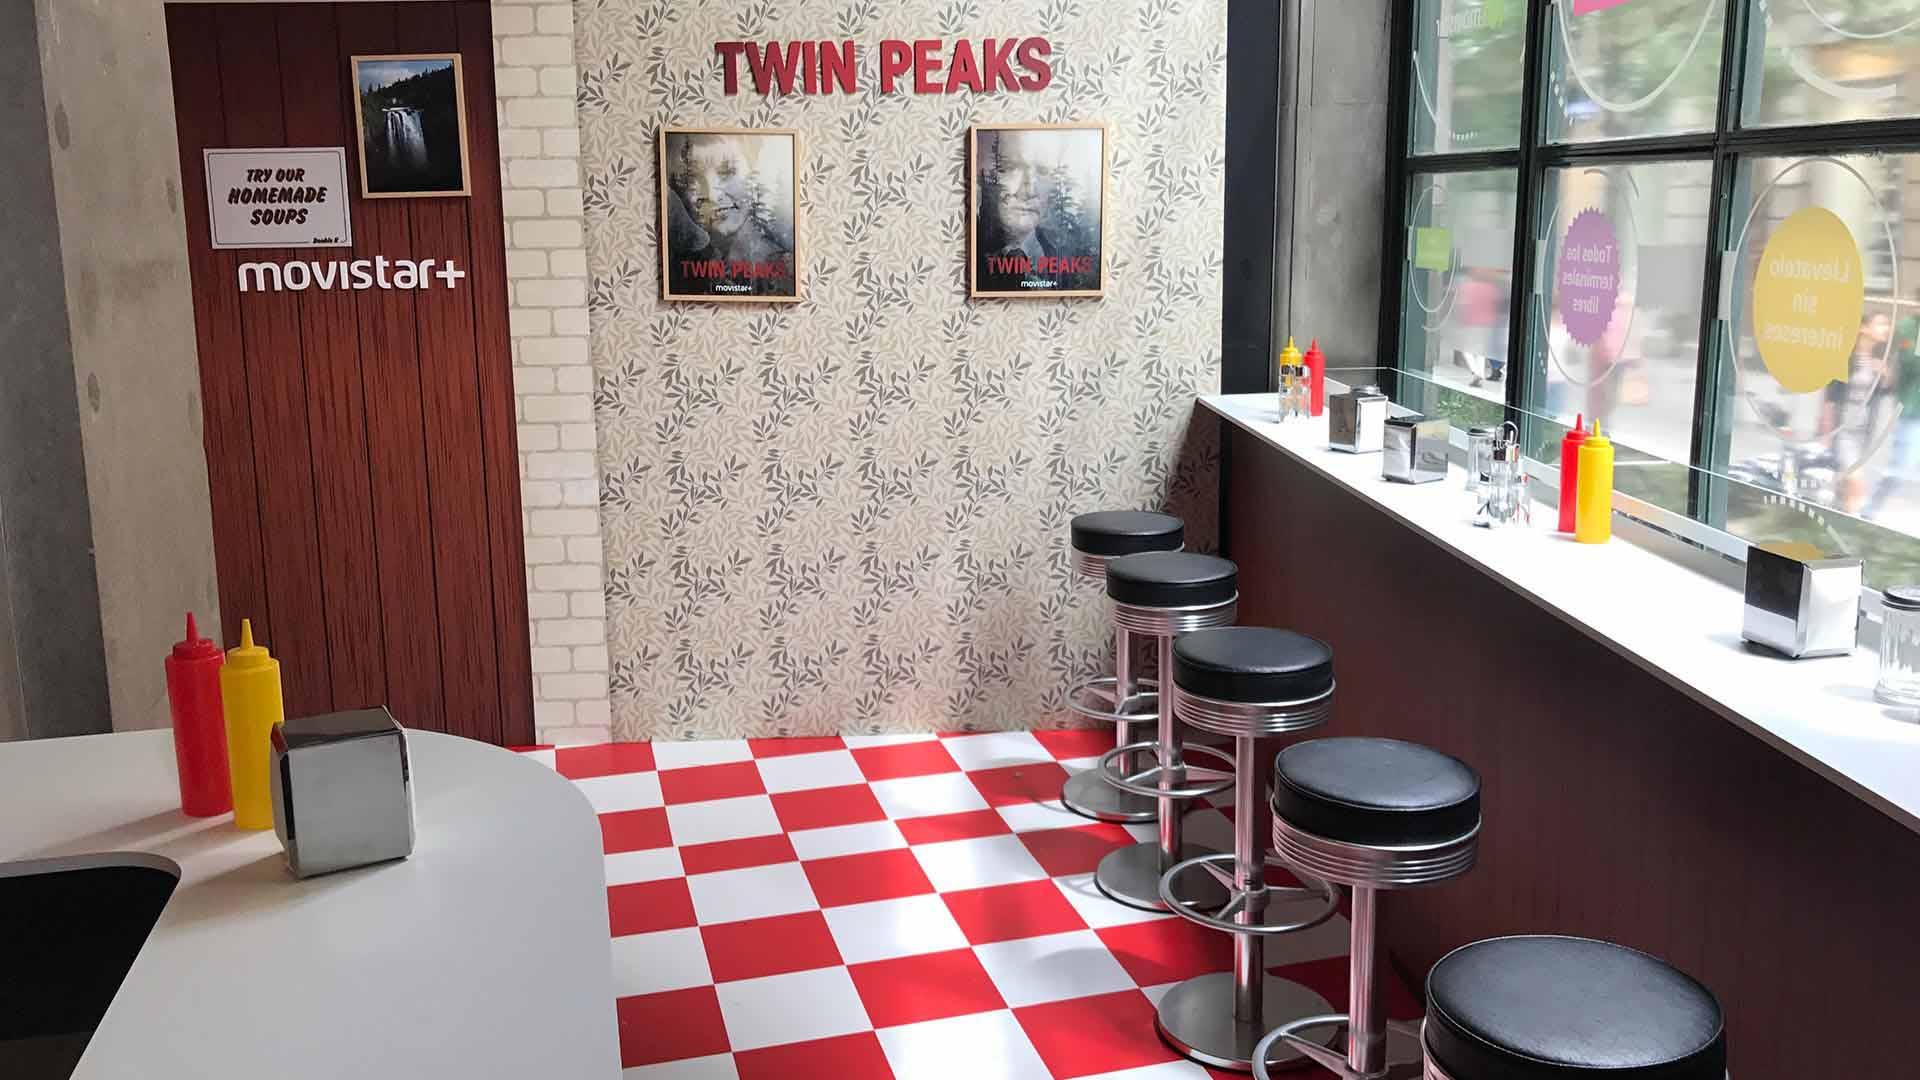 Twin peaks Event presentation. Cafeteria design